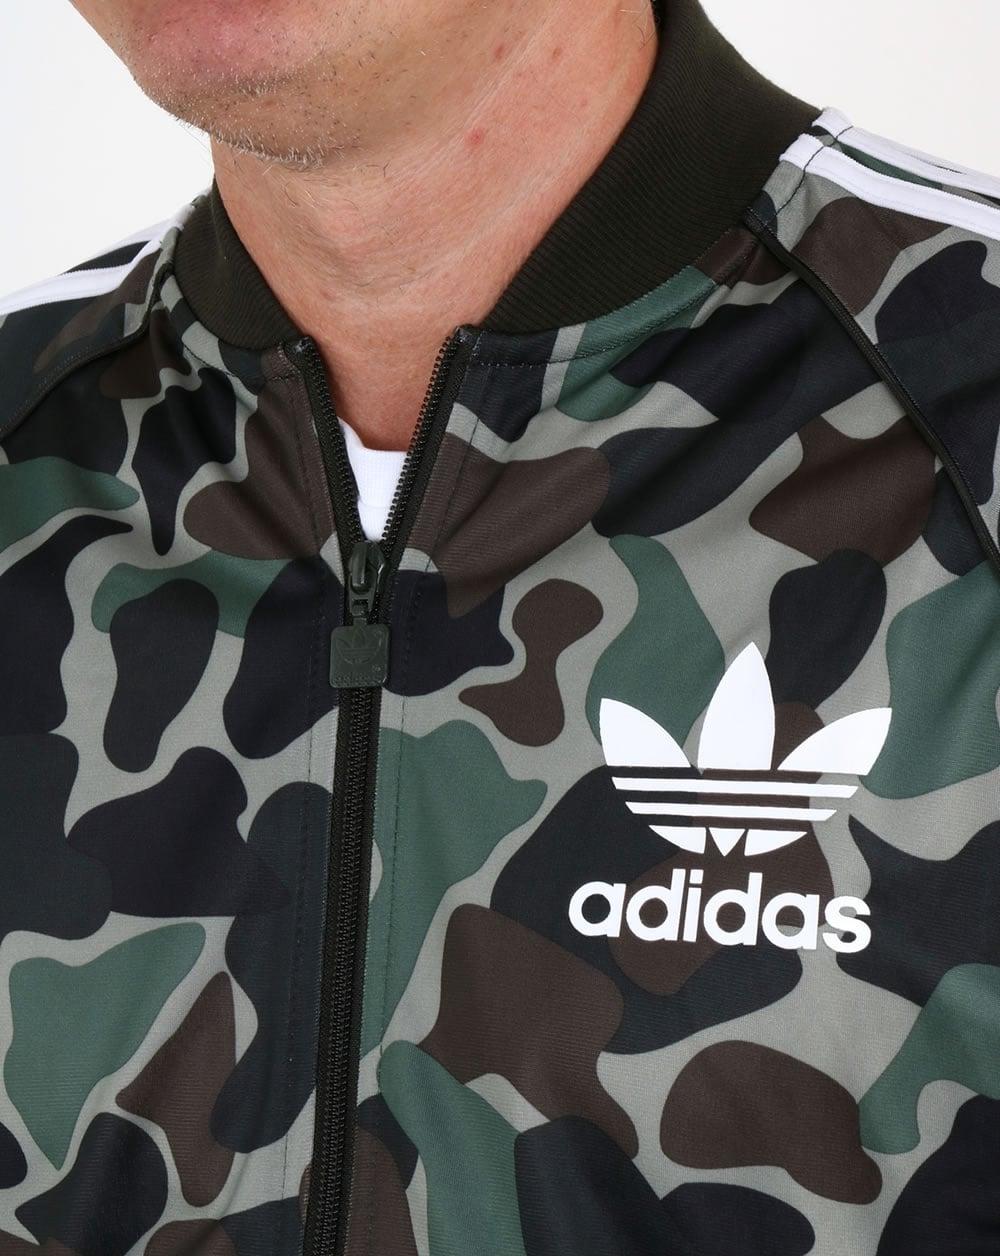 Men Adidas Originals Superstar Track Top Orange Tops